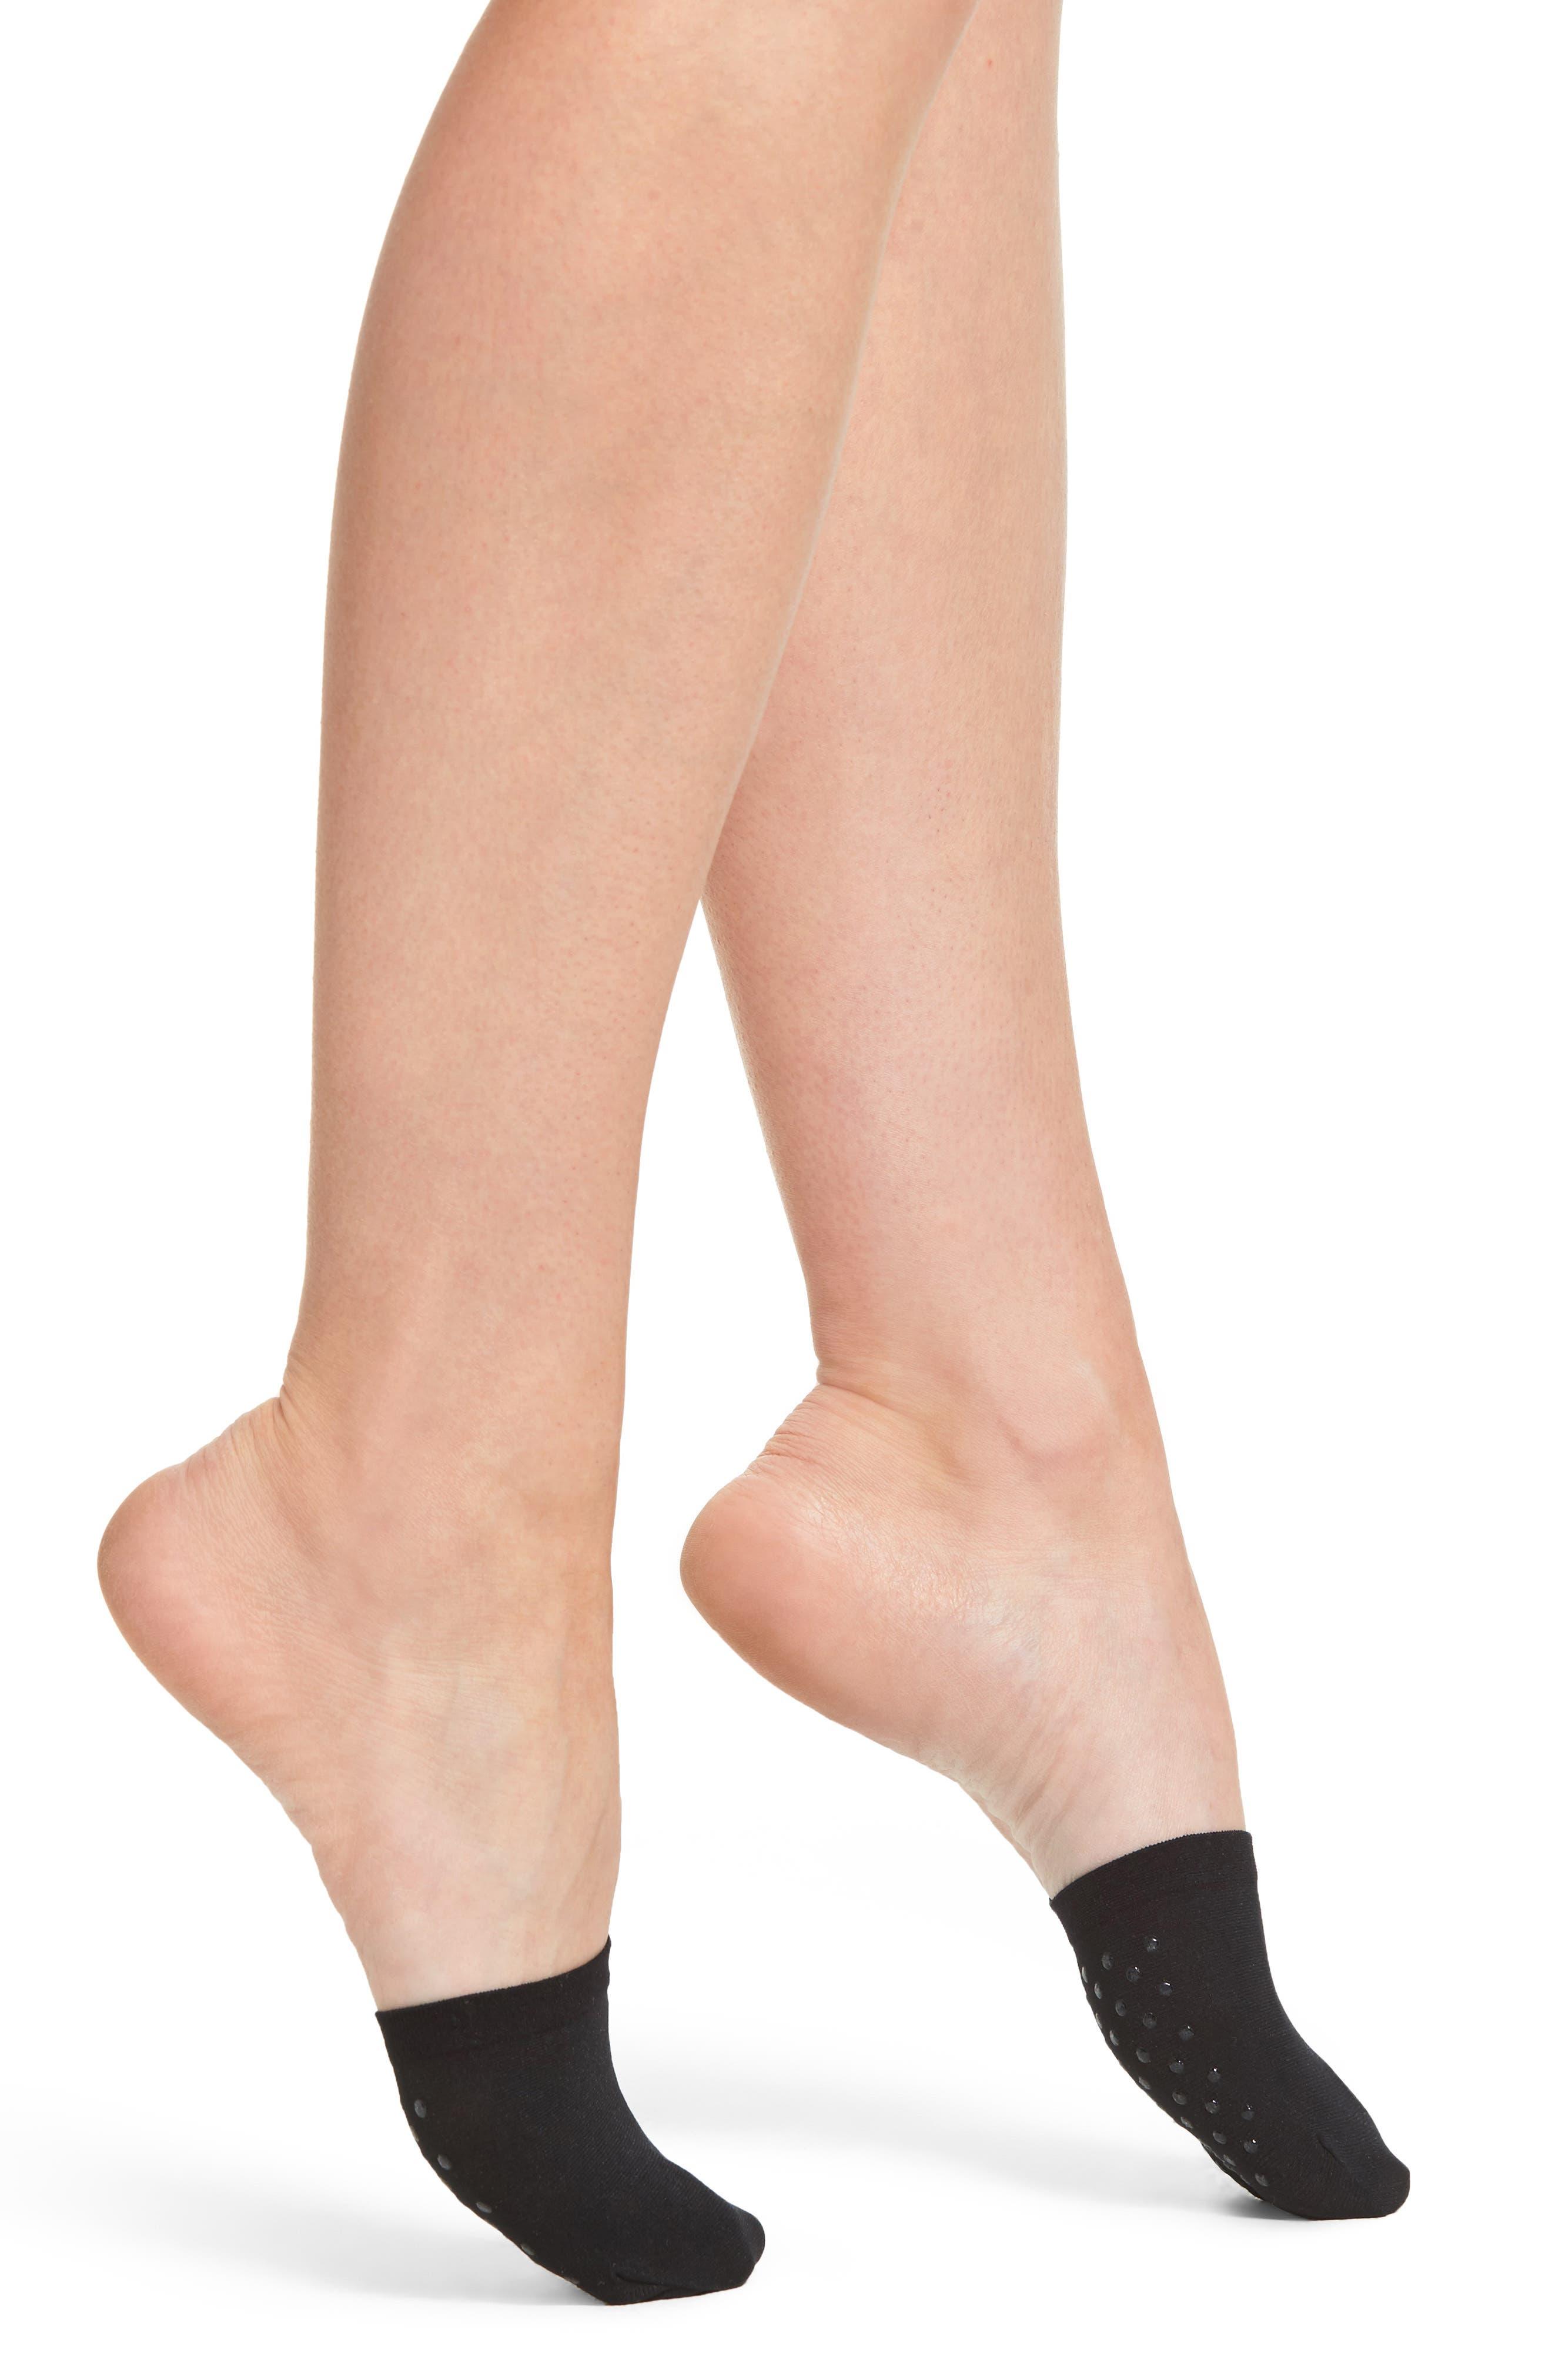 2-Pack Gripper Mule Socks,                             Main thumbnail 1, color,                             001